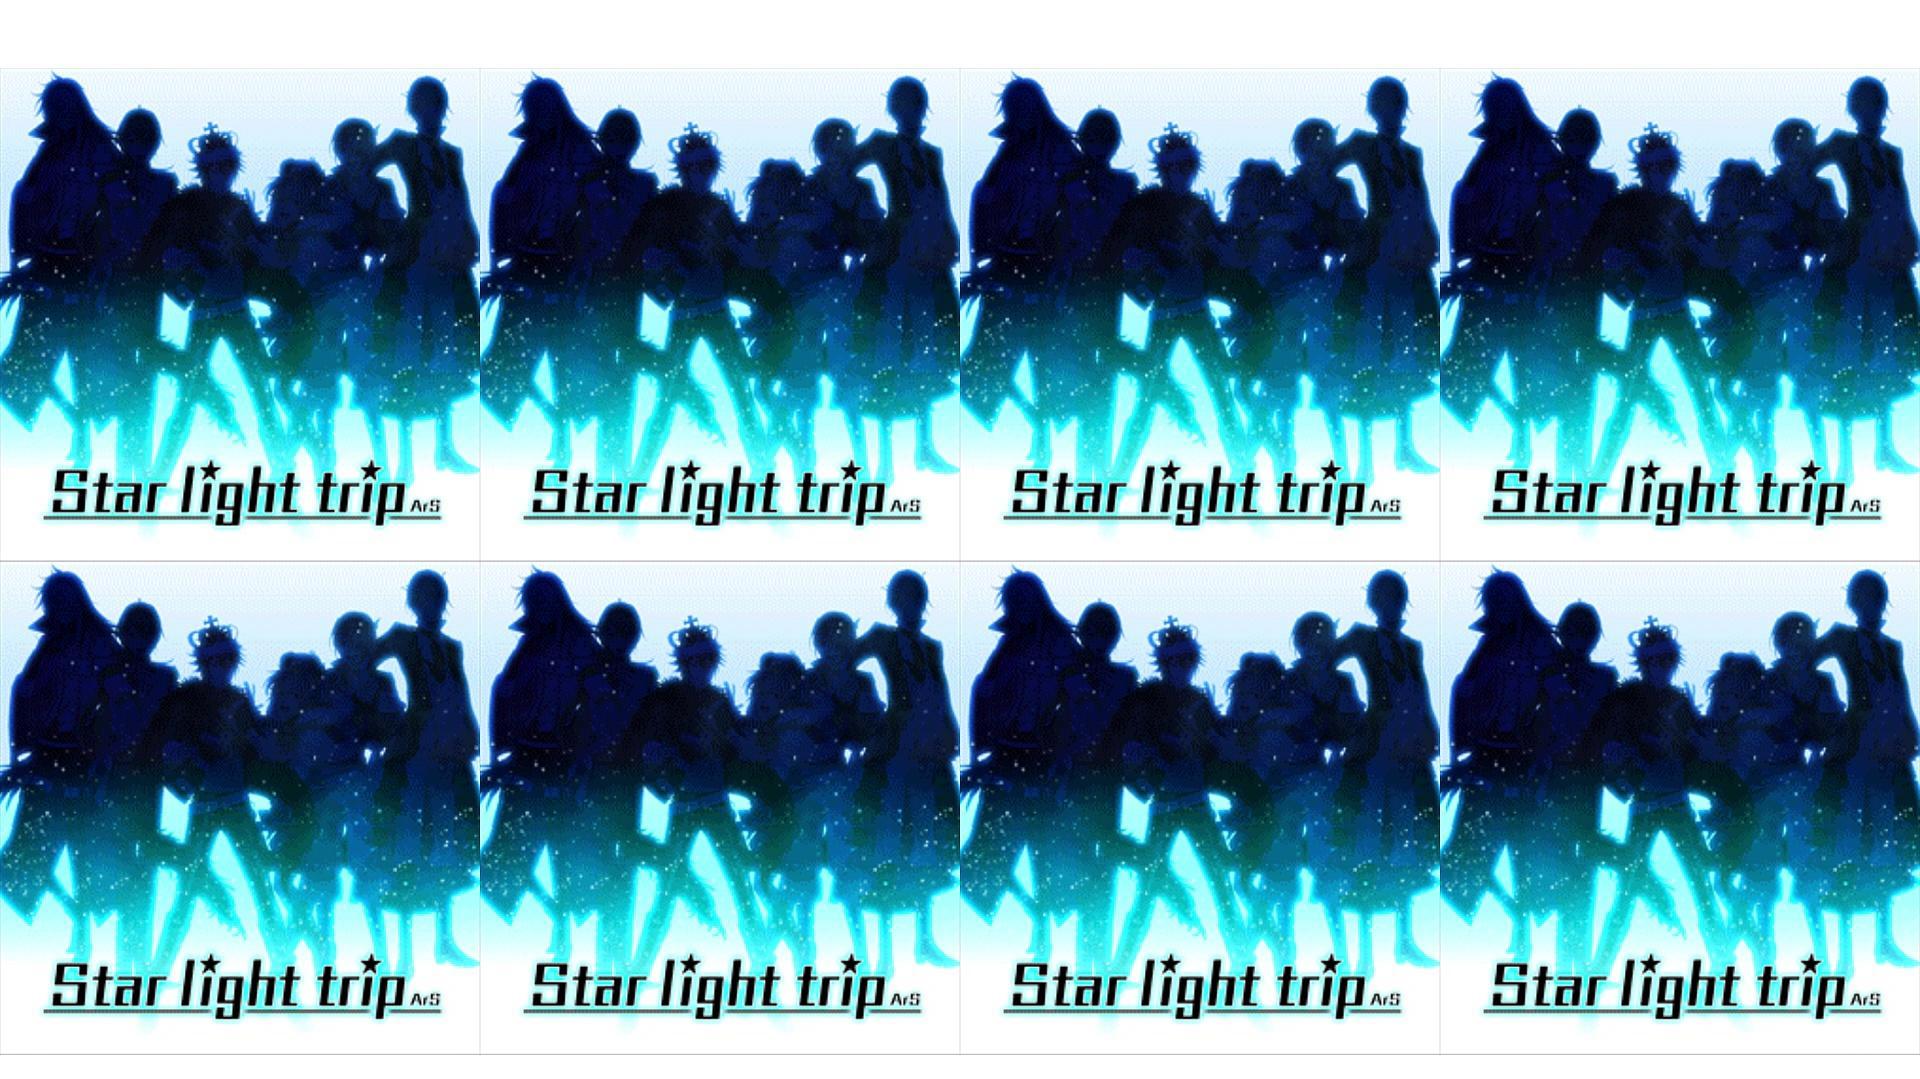 Star Light Trip - ArS